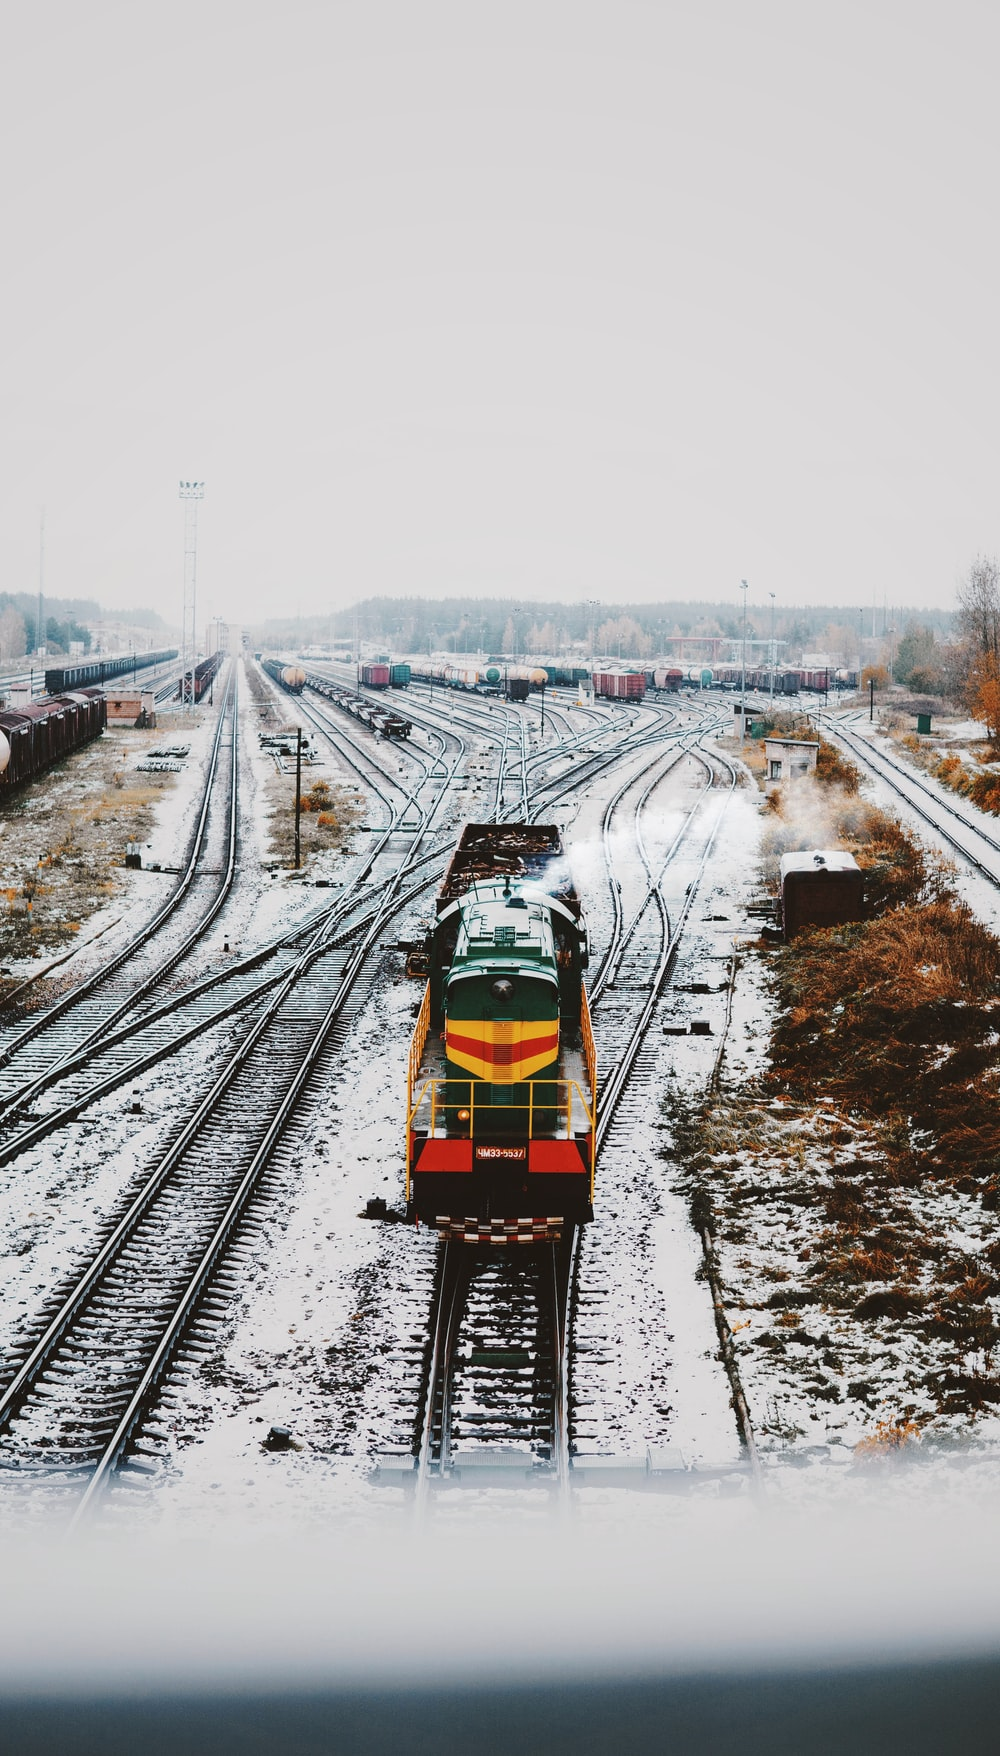 moving yellow and green locomotive train on train railways